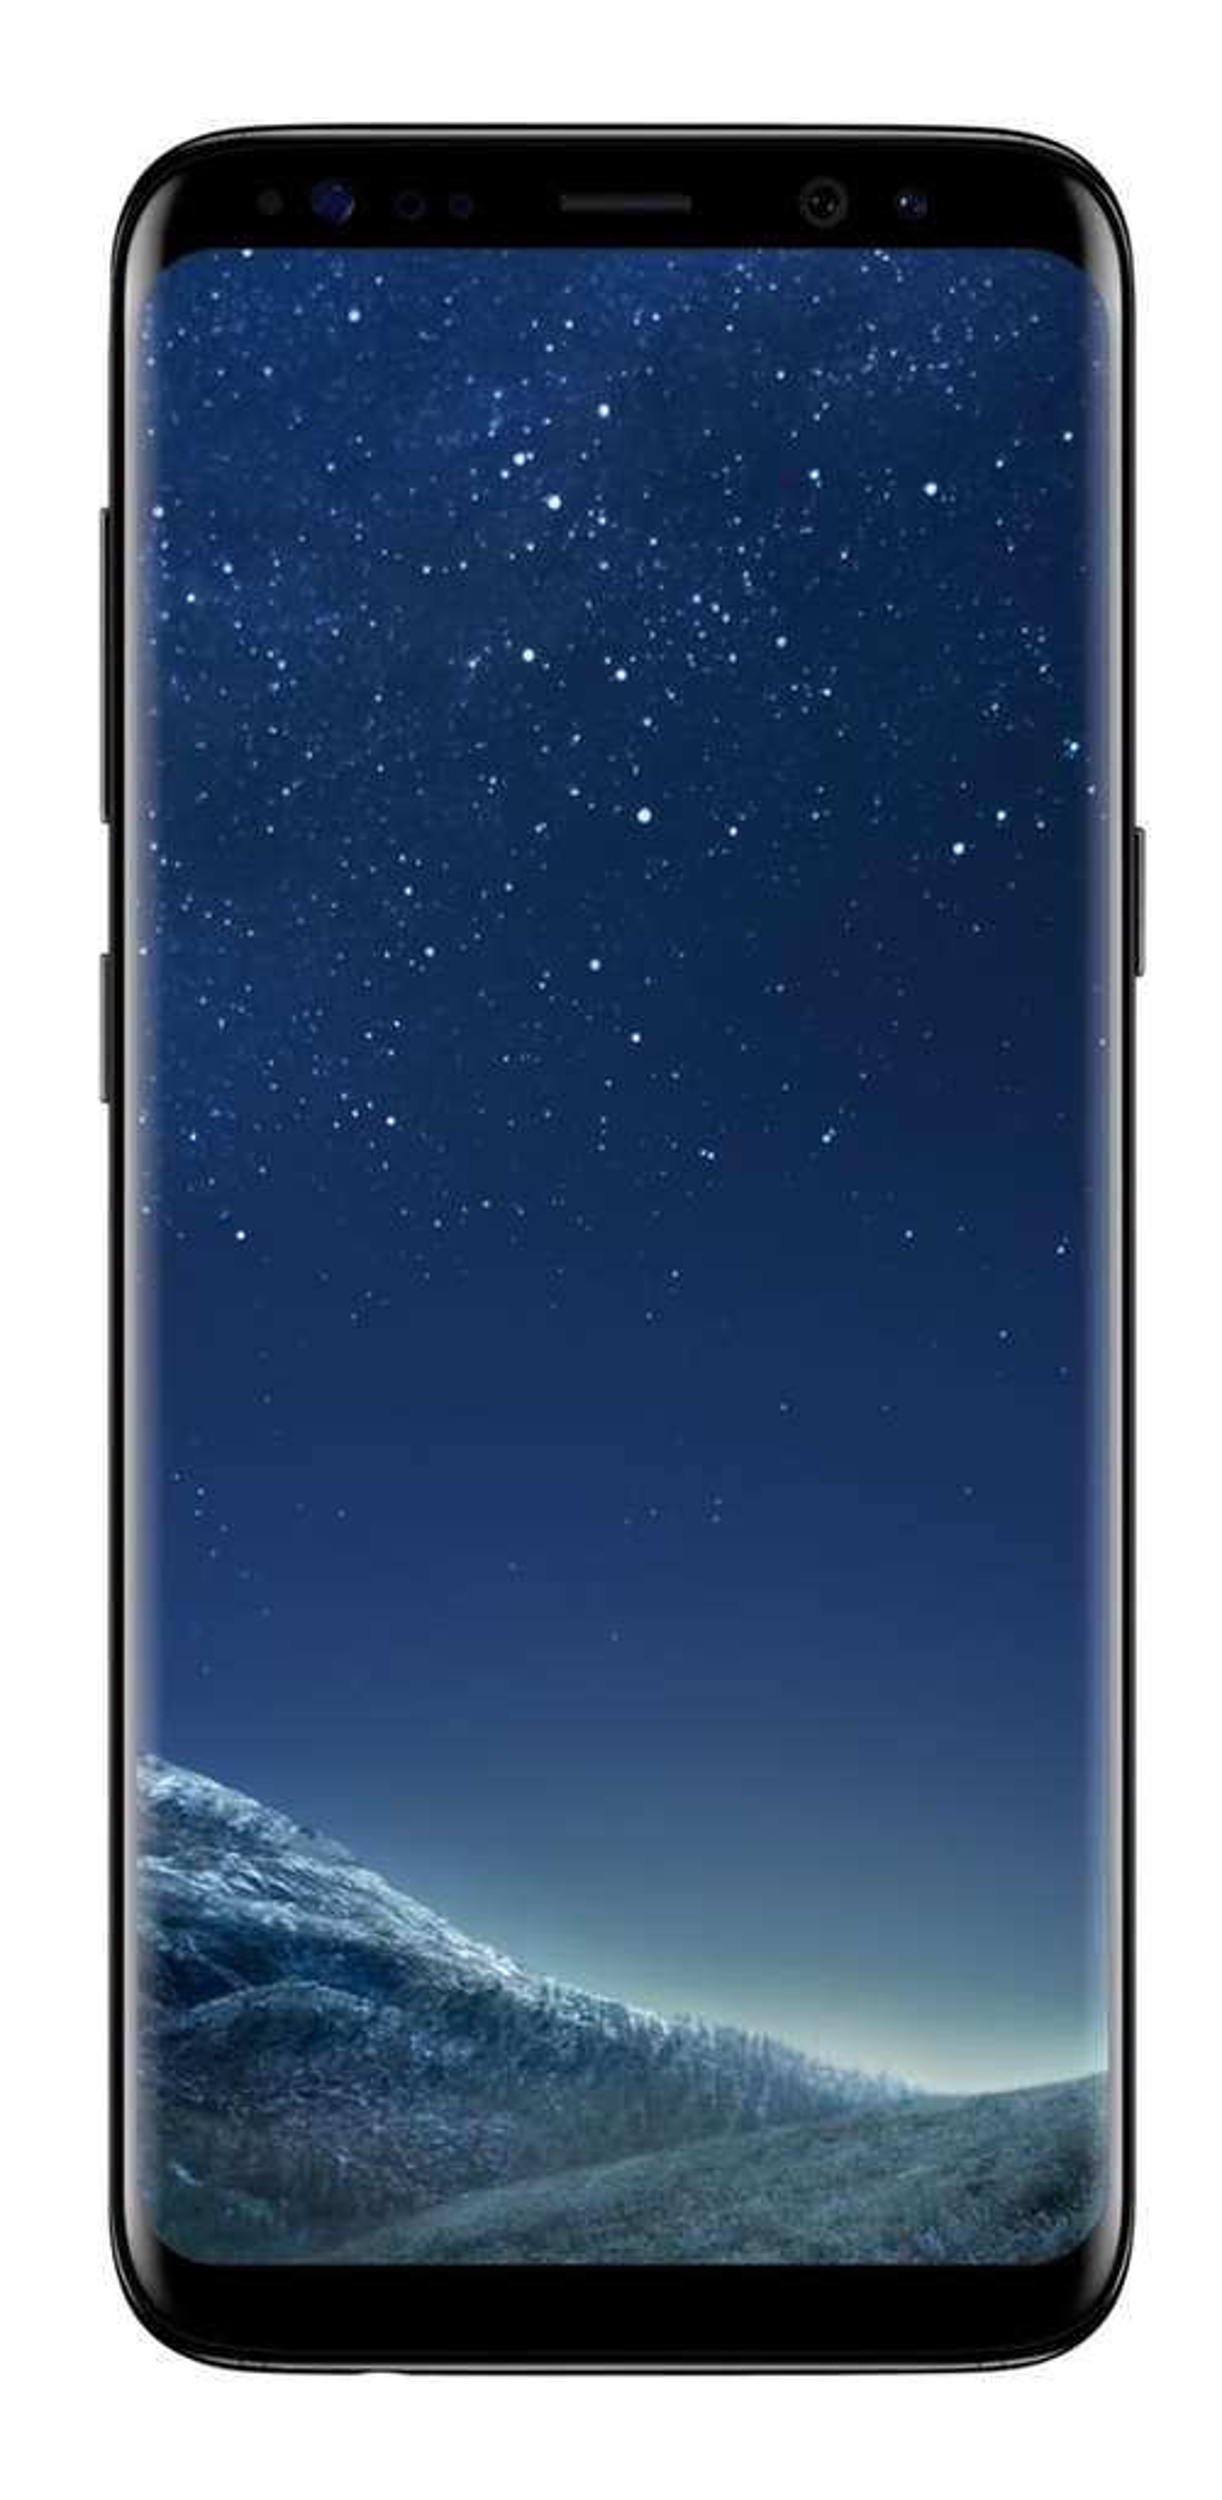 carte cumulus smartphone 5 8 samsung galaxy s8 64 go. Black Bedroom Furniture Sets. Home Design Ideas